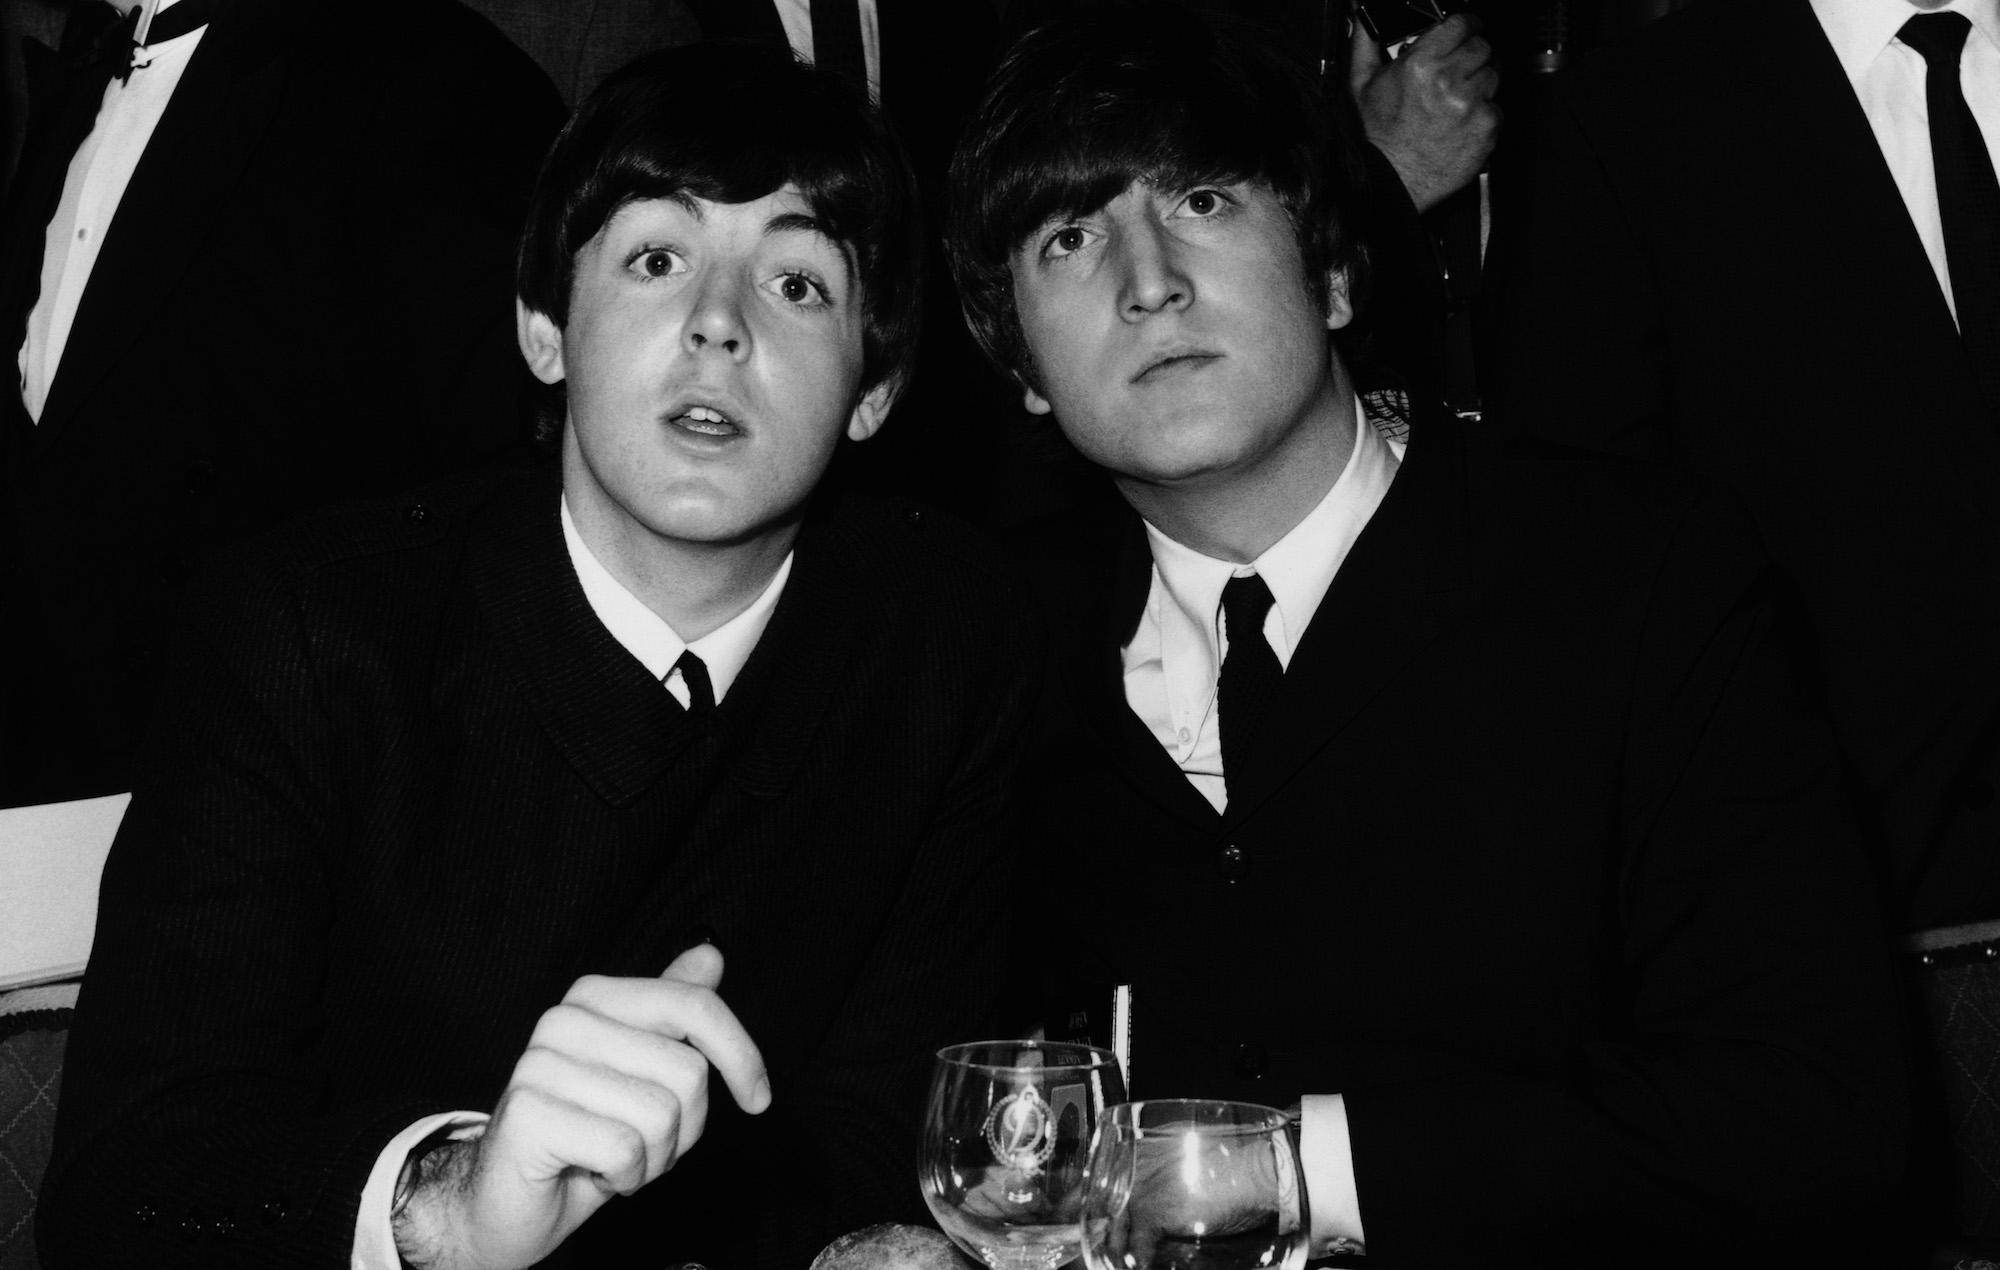 Paul McCartney John Lennon drill